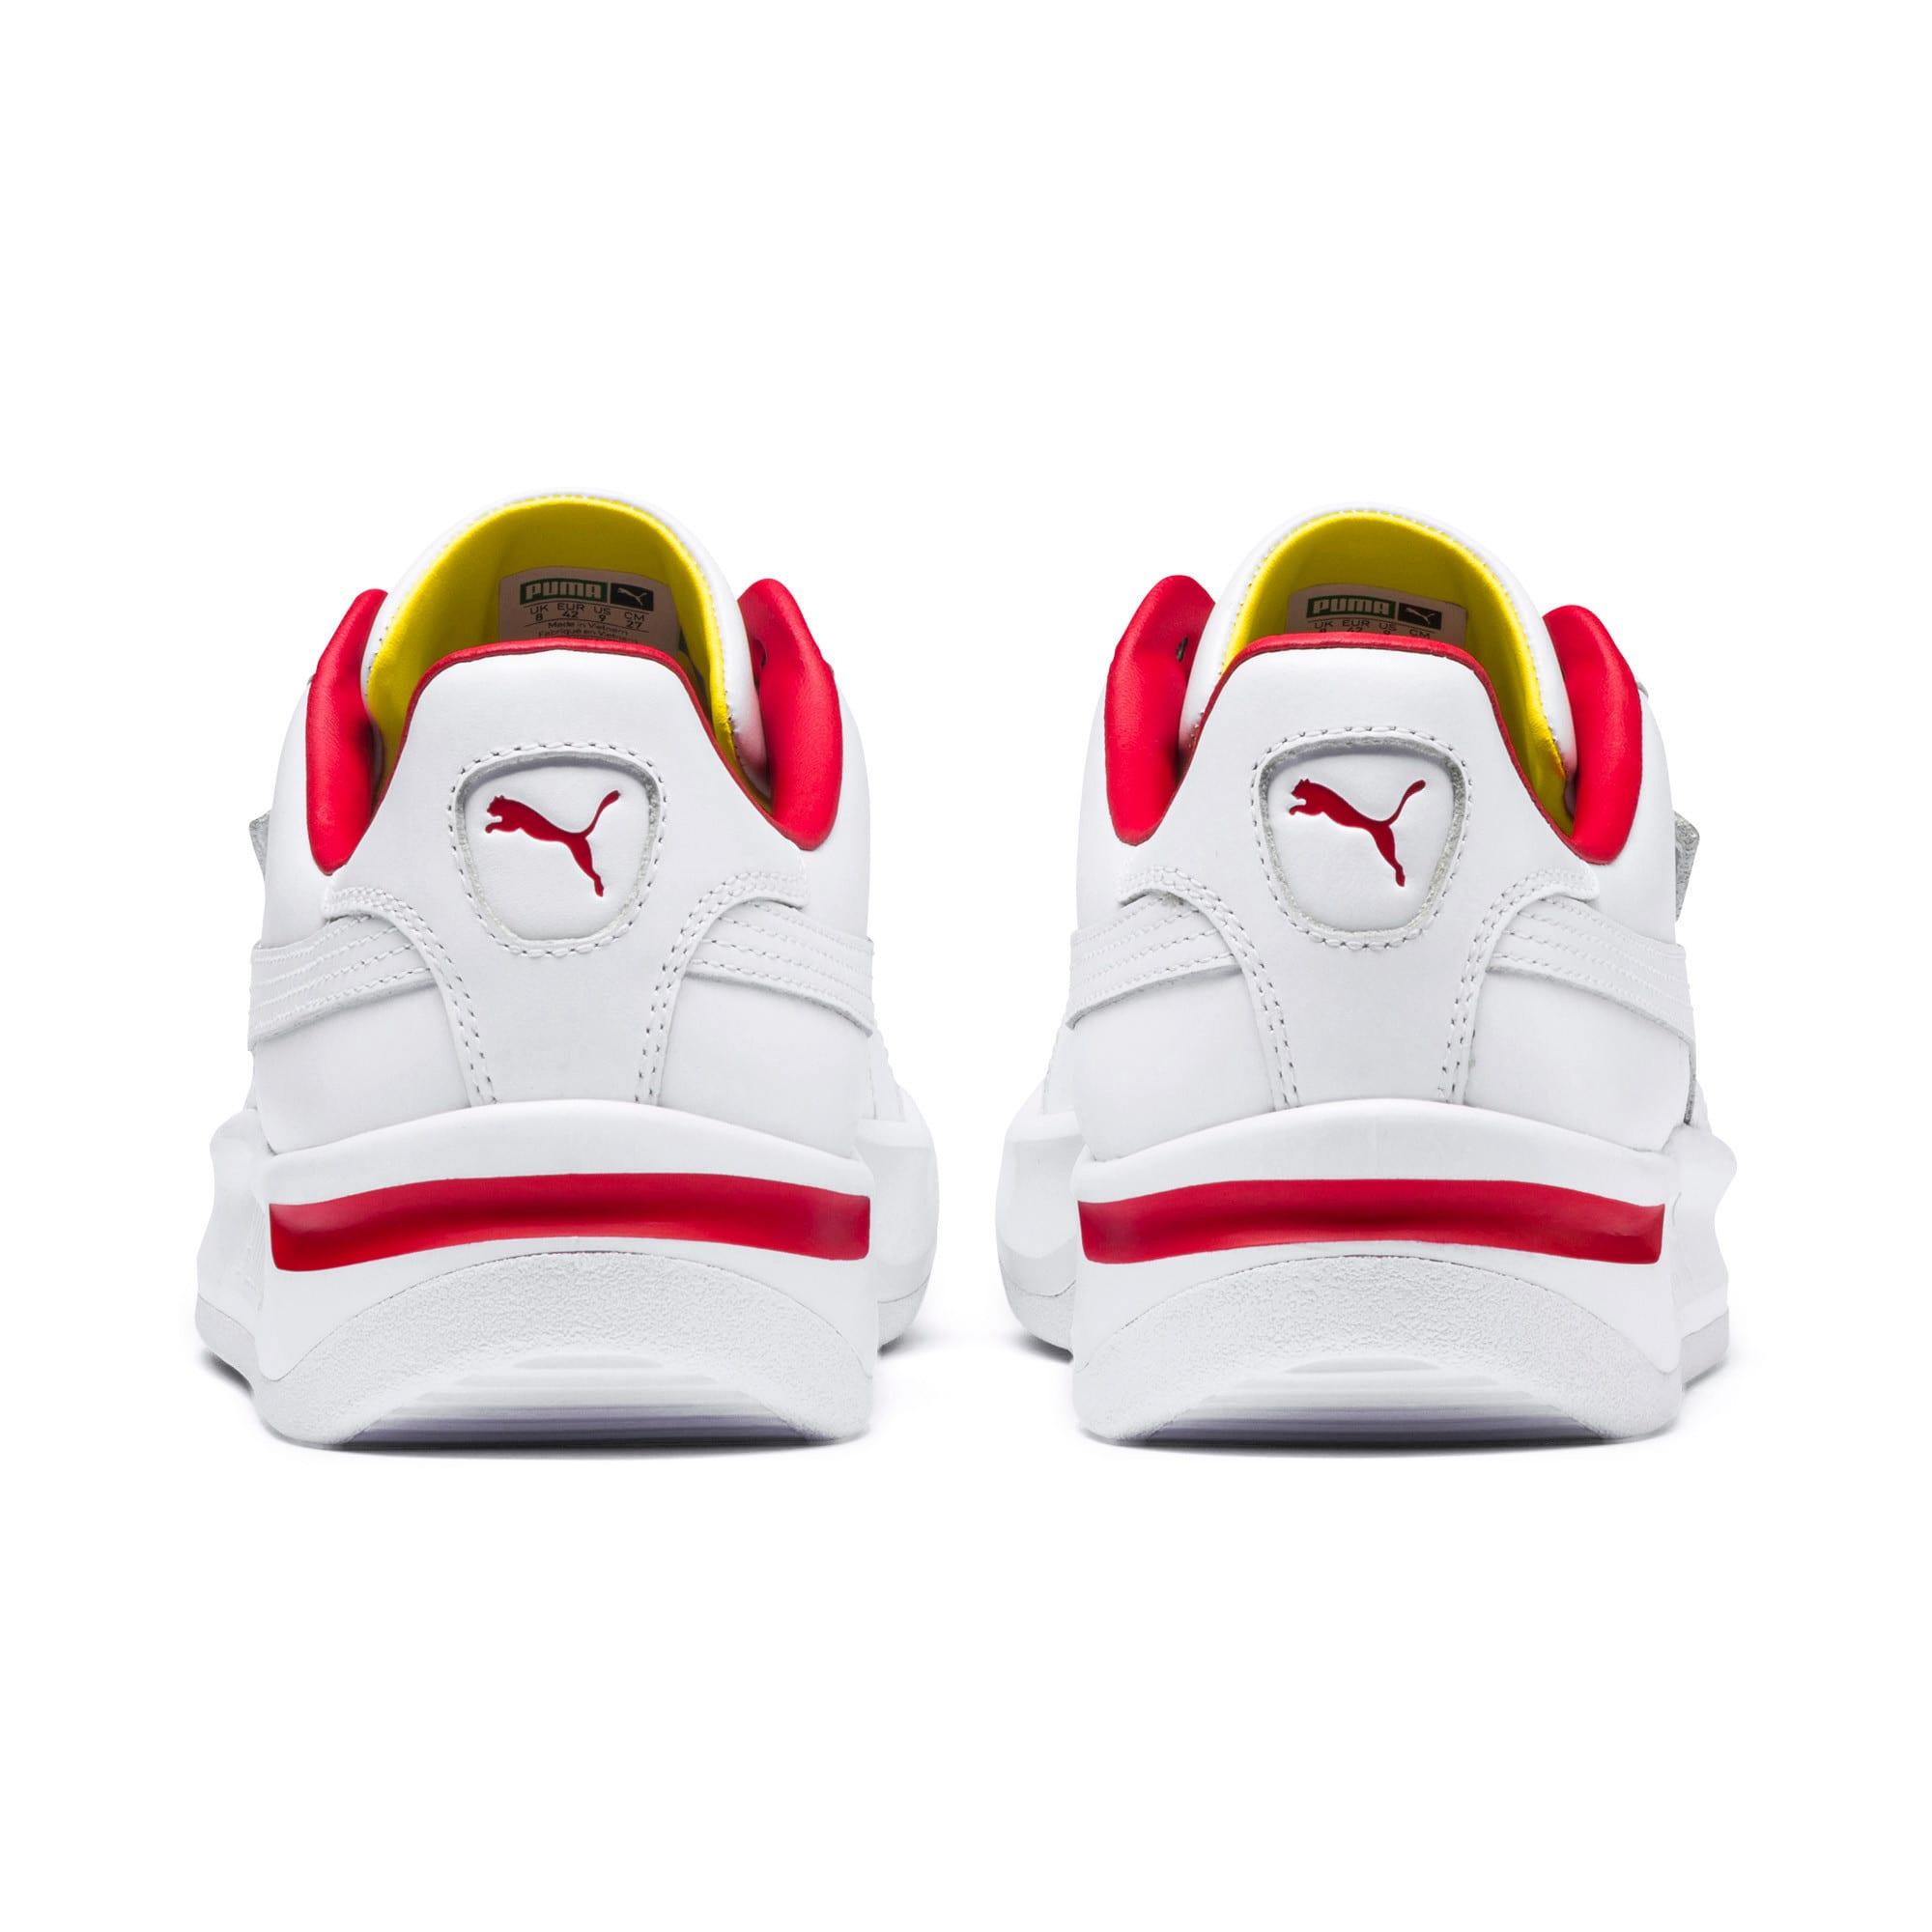 Thumbnail 4 of California Drive Thru schoenen, P Wht-HighRiskRed-Blazg Yelw, medium